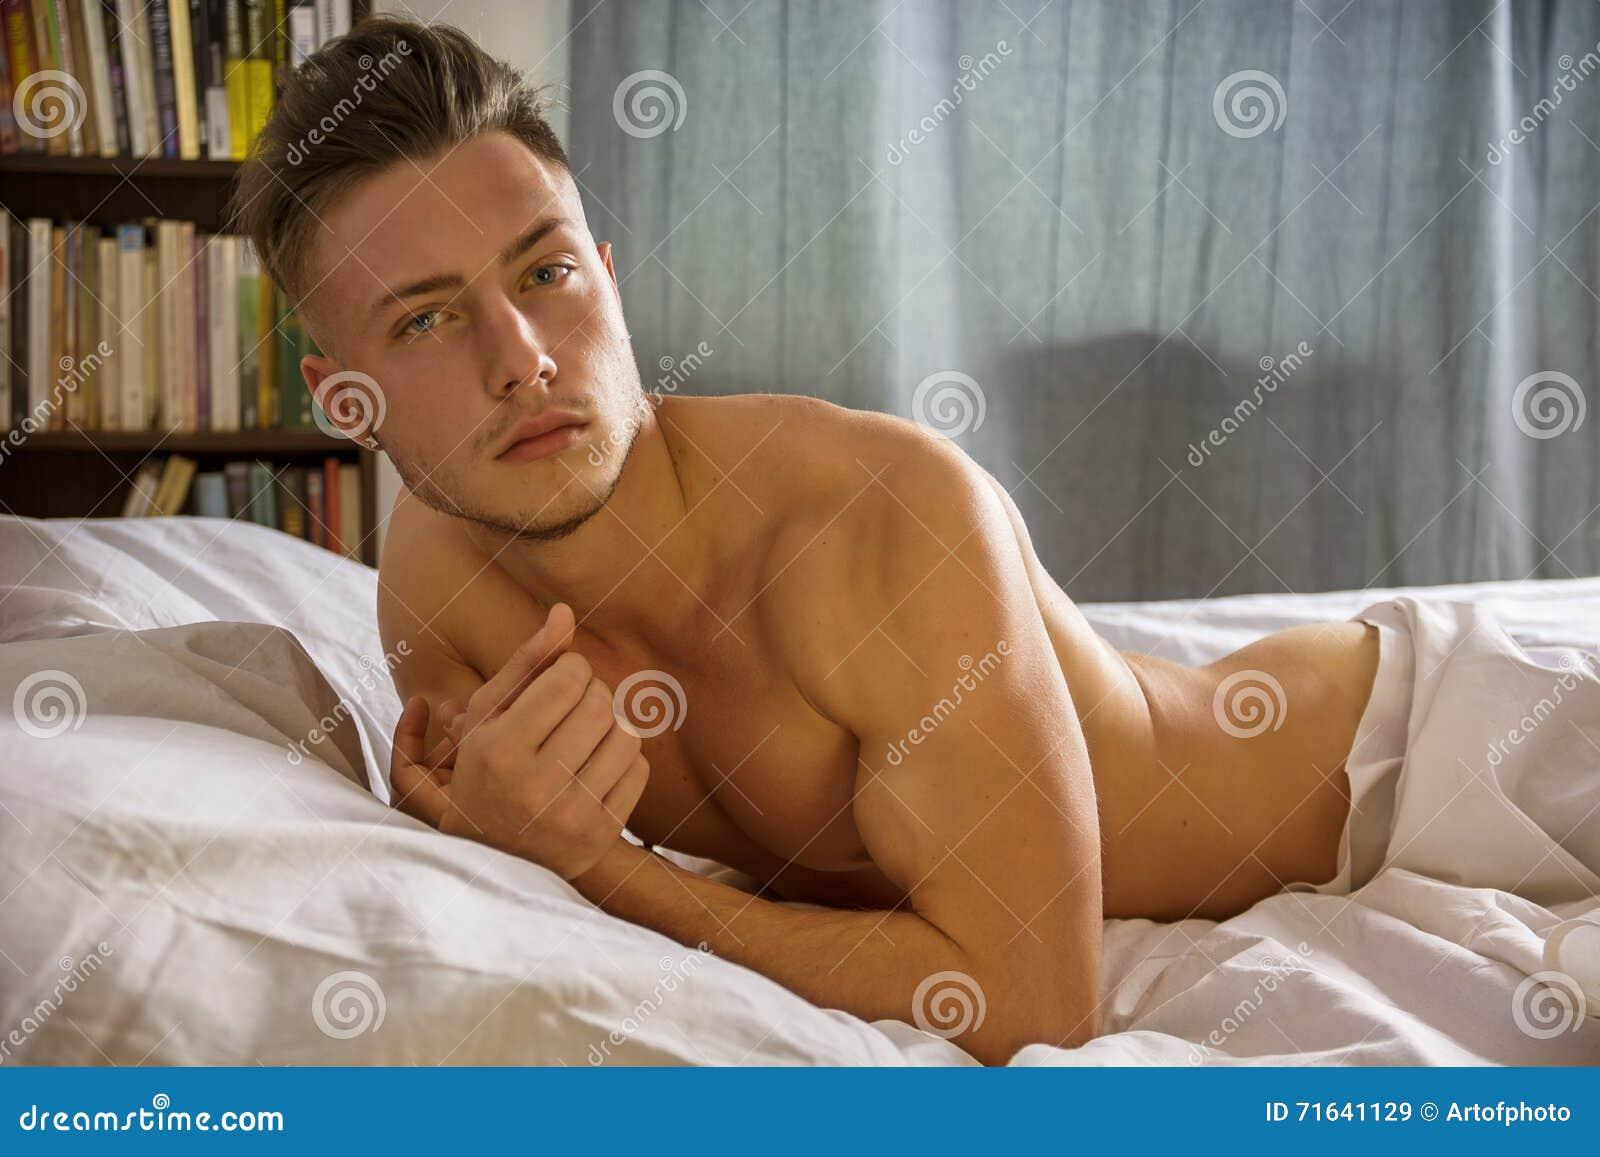 Sexy nackter Mann Bild